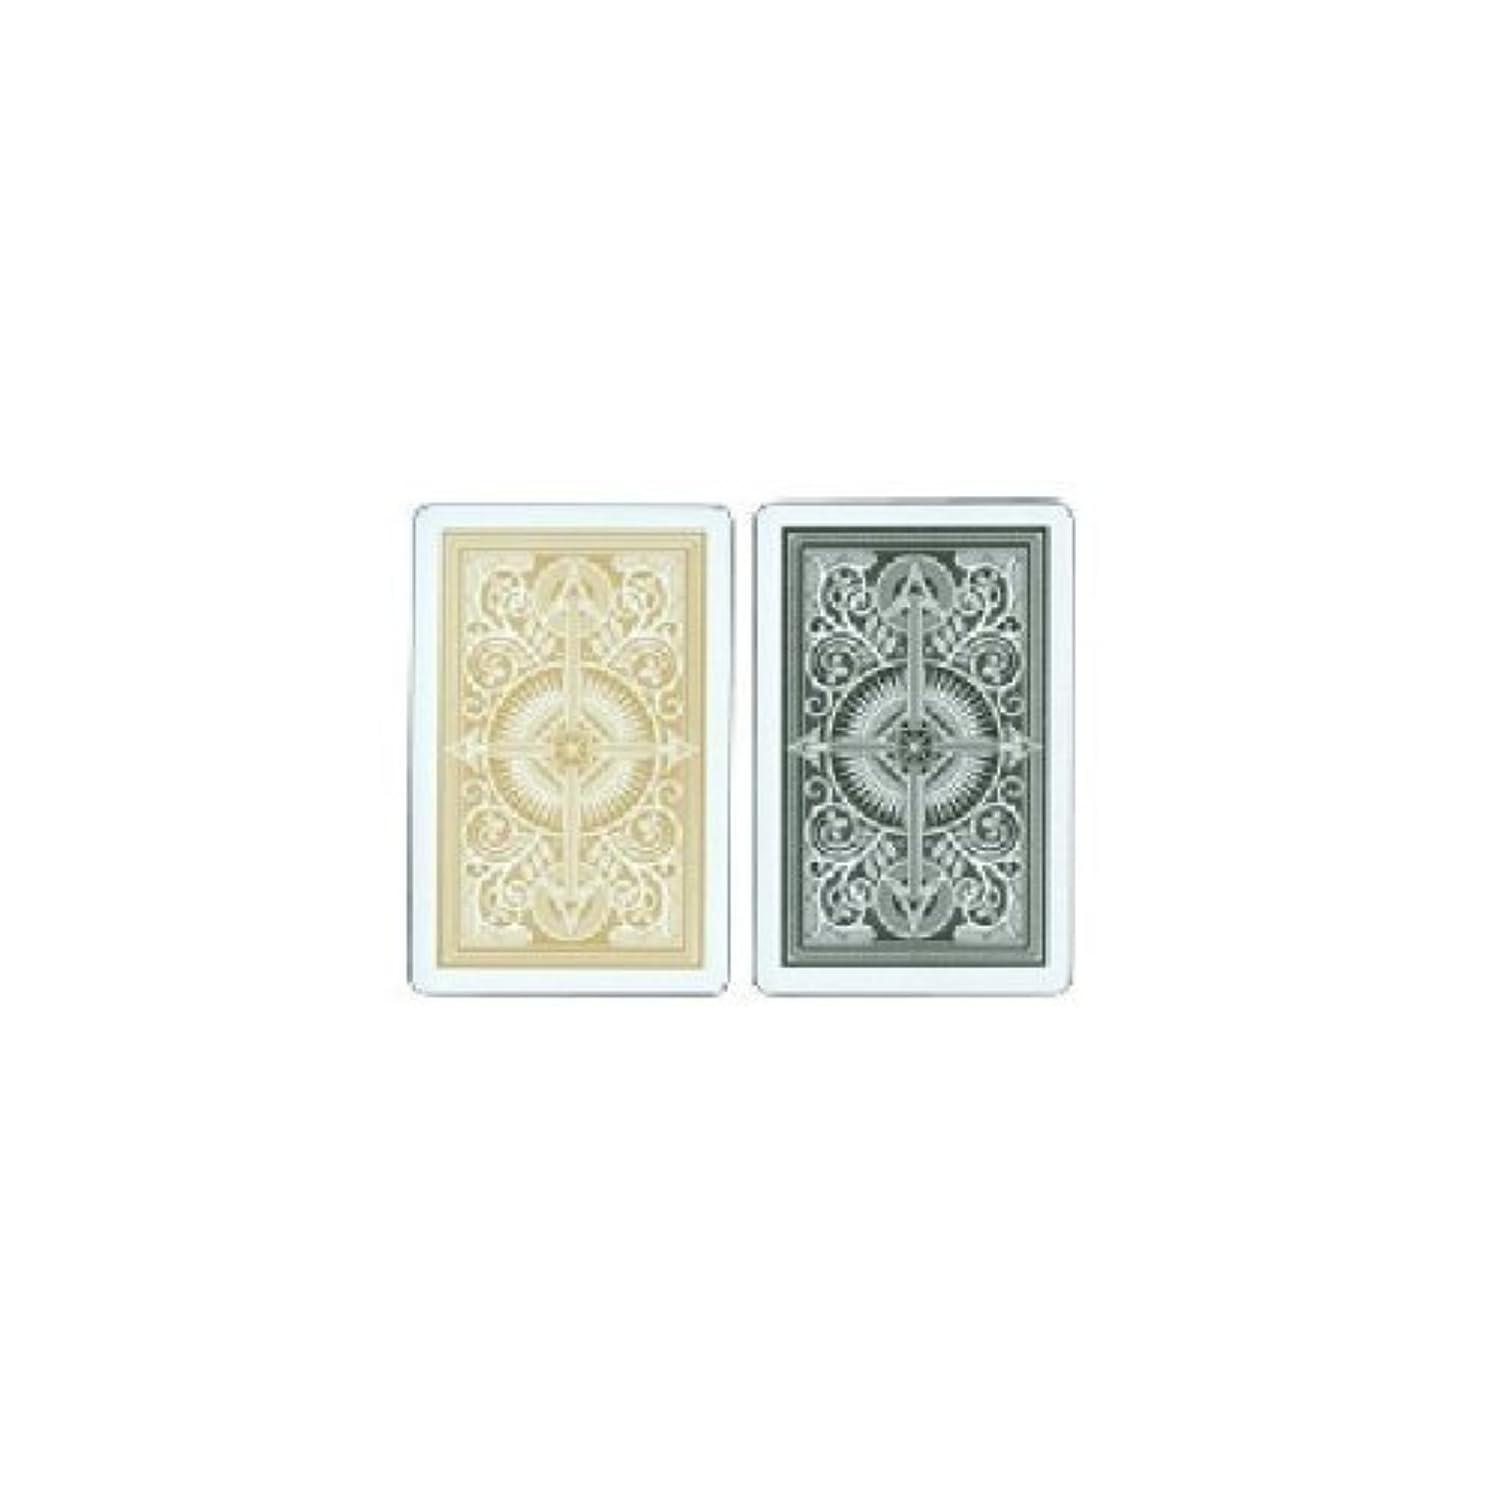 KEM Arrow 100% Plastic Playing Card 2 Deck Set - Choose!